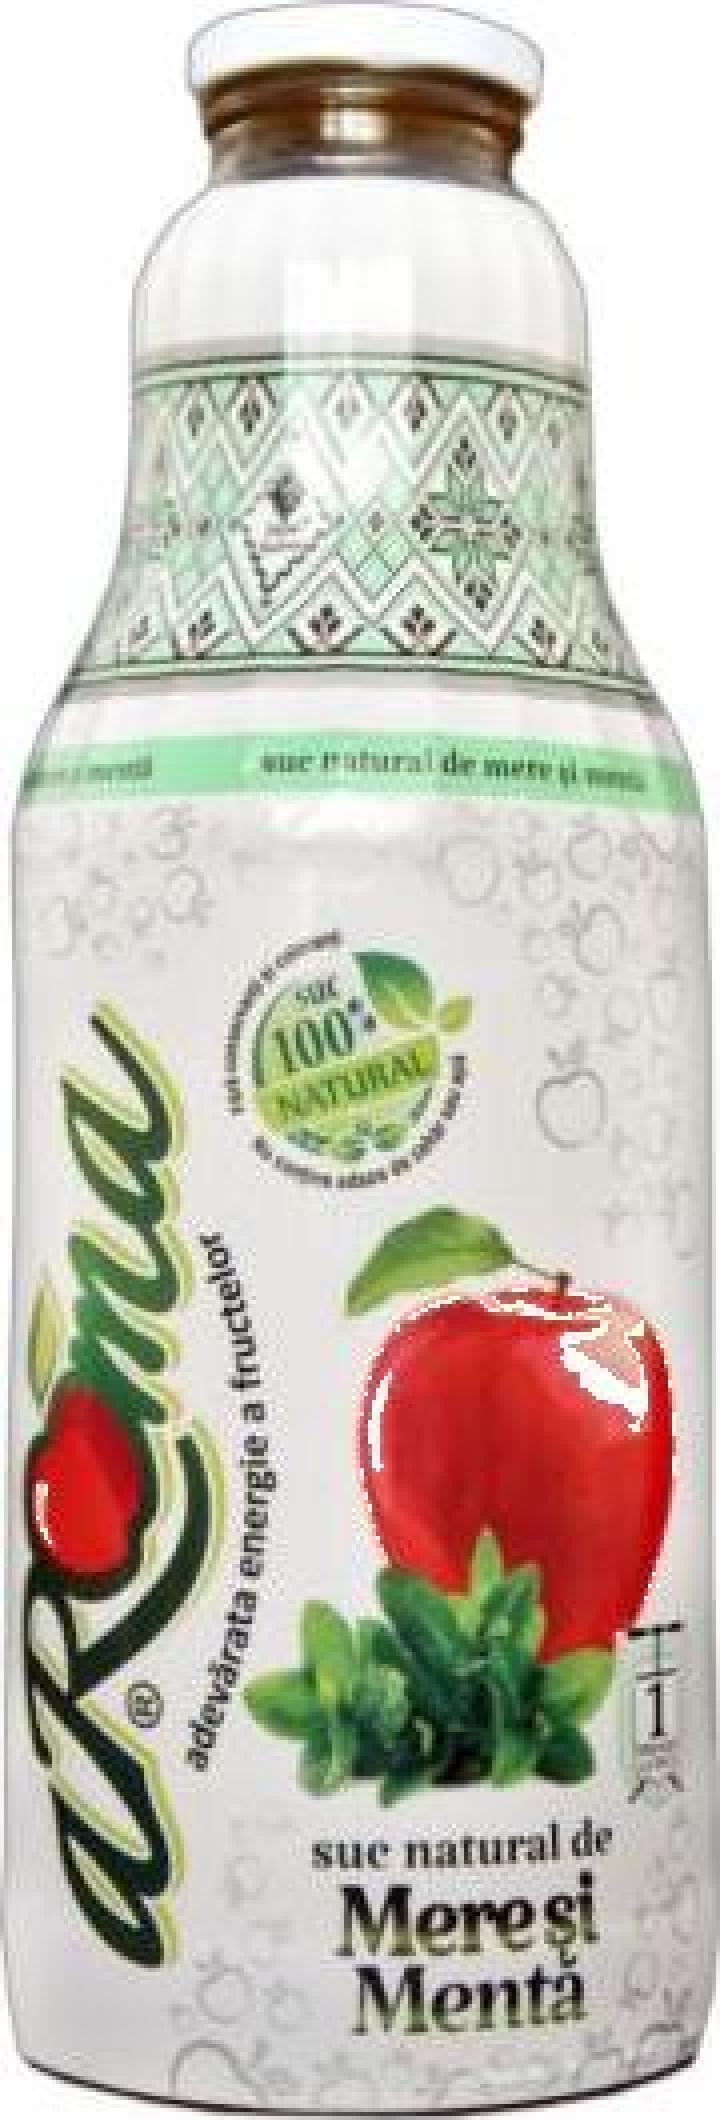 Suc natural de mere si menta - Aroma 1 L